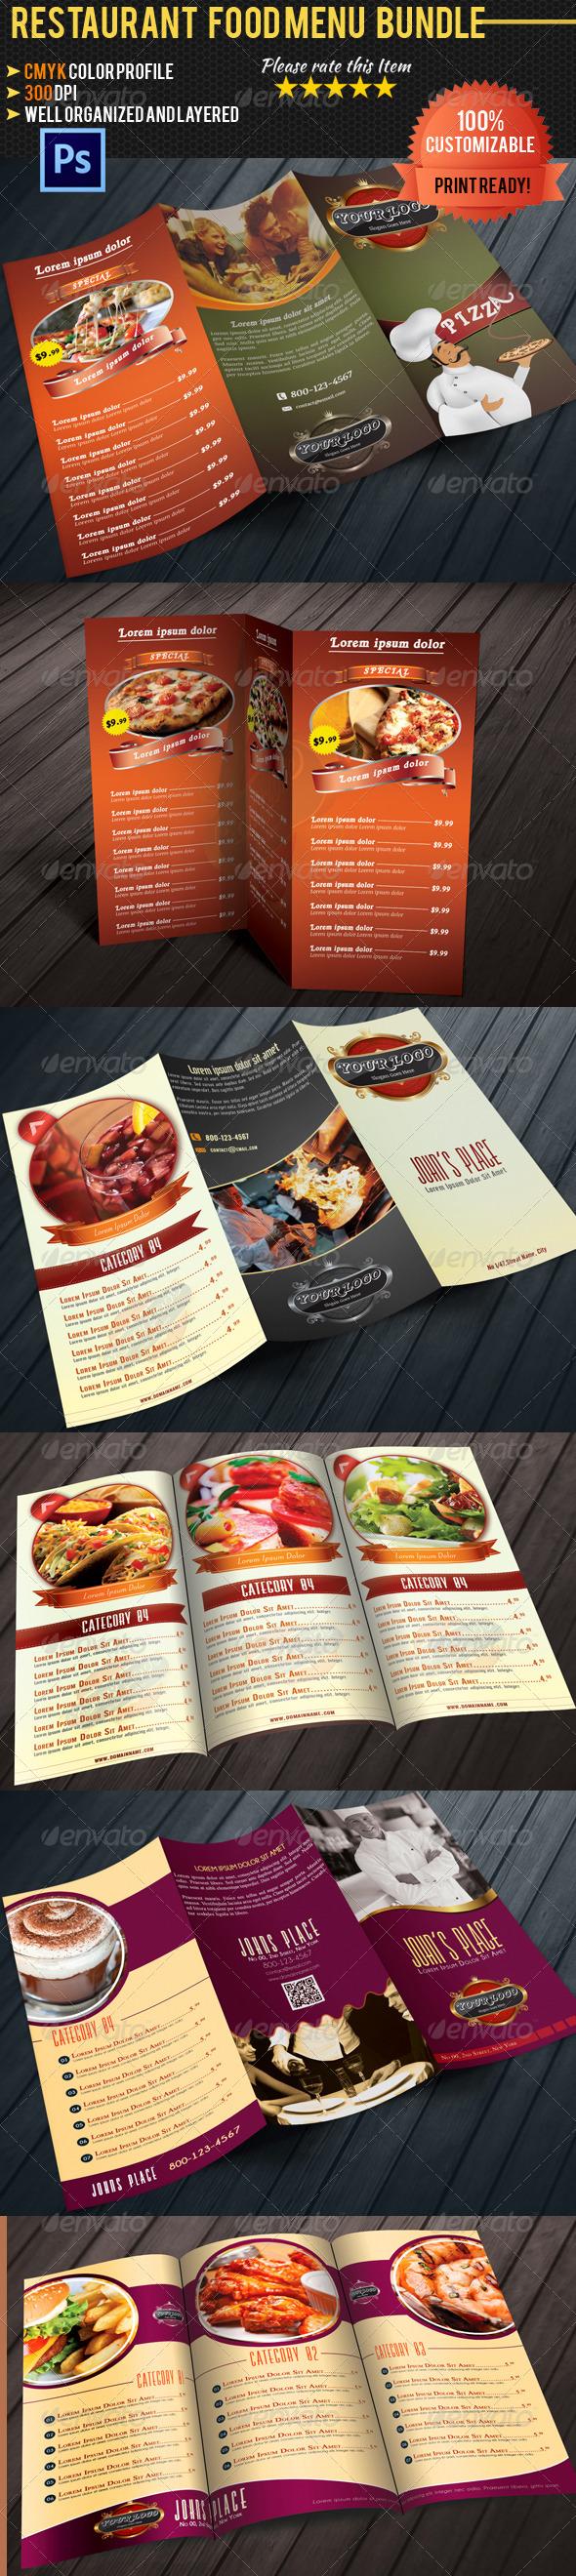 GraphicRiver Tri-fold Restaurant Food Menu Template Bundle 4727260